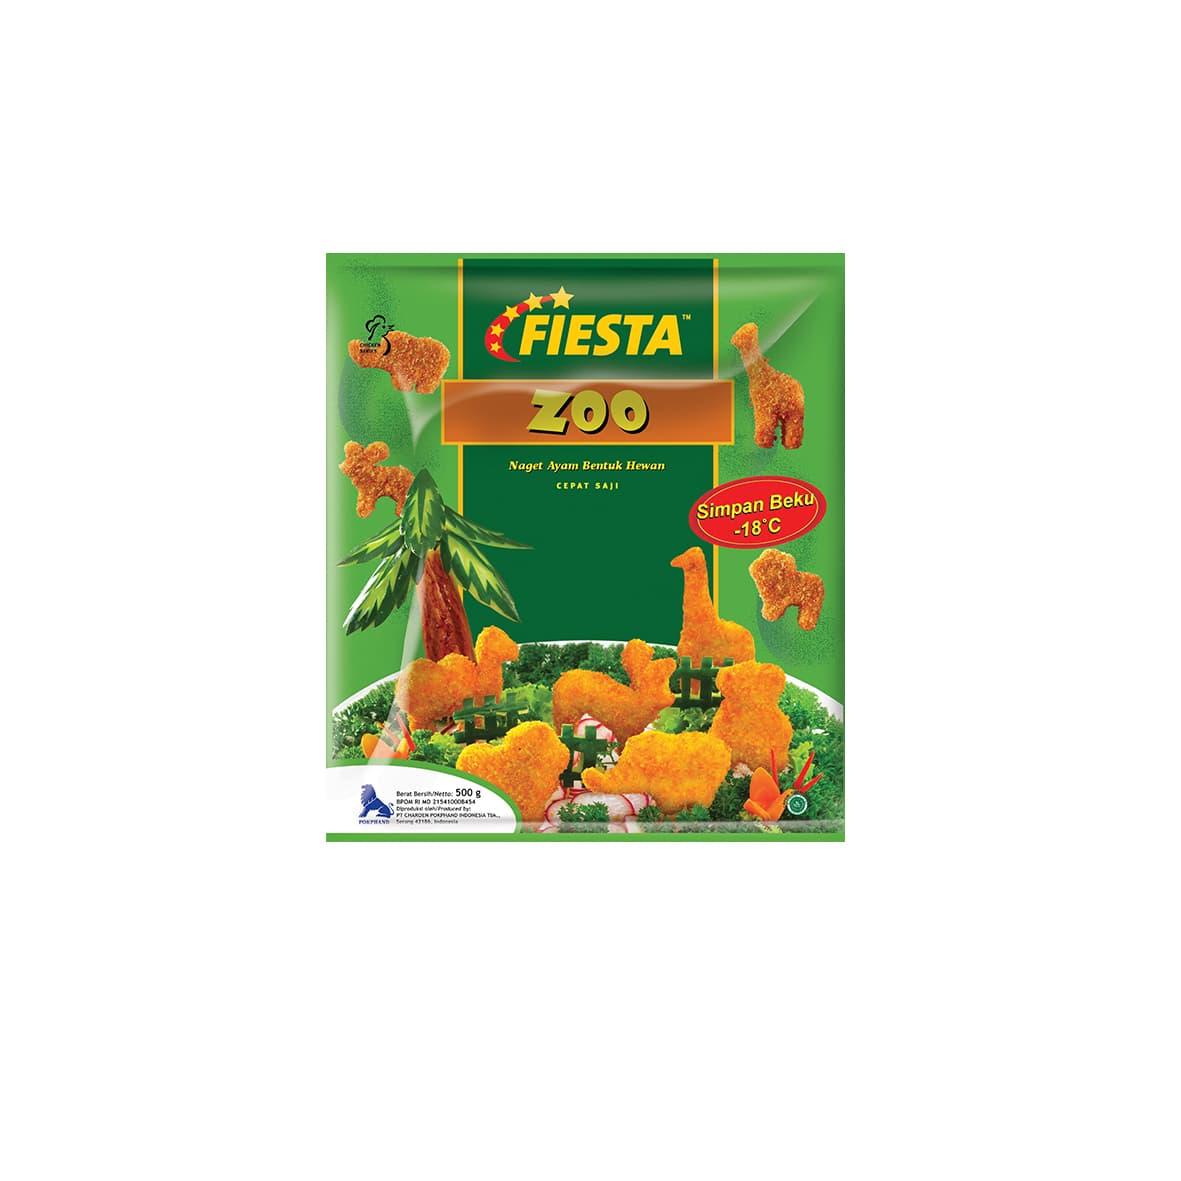 Fiesta Paket Nugget Zoo Makanan Instan 500 G (3 Pcs) - Blanja.com